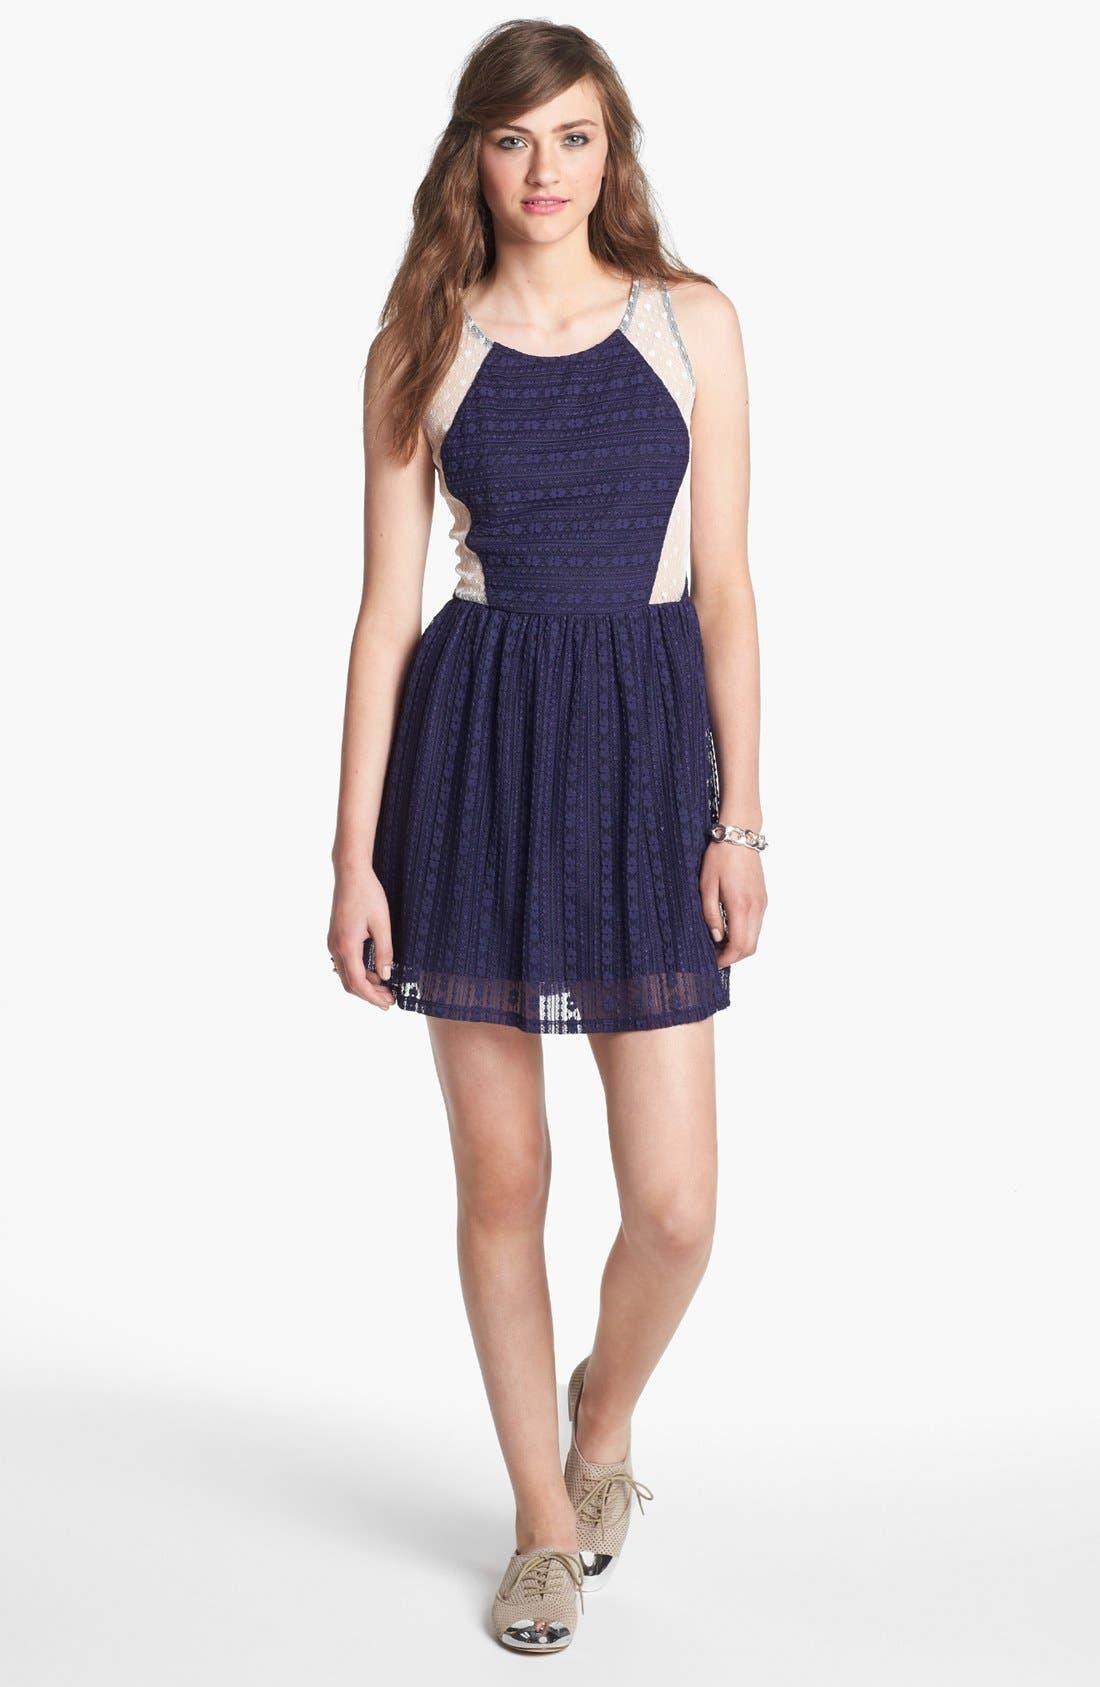 Main Image - Robin K Lace Illusion Skater Dress (Juniors)